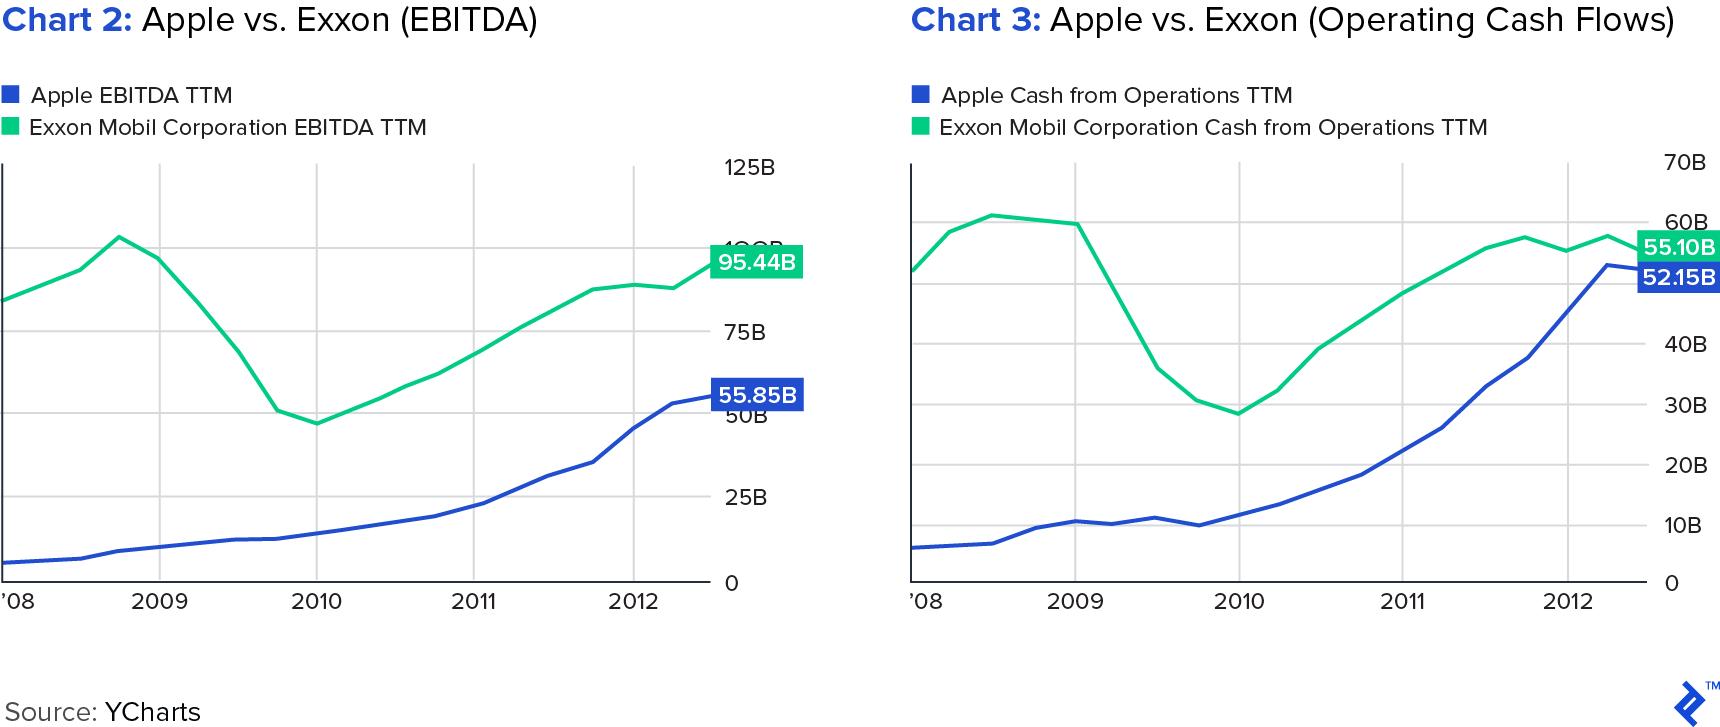 Chart 2: Apple vs. Exxon – EBITDA and Chart 3: Apple vs. Exxon – Operating Cash Flows